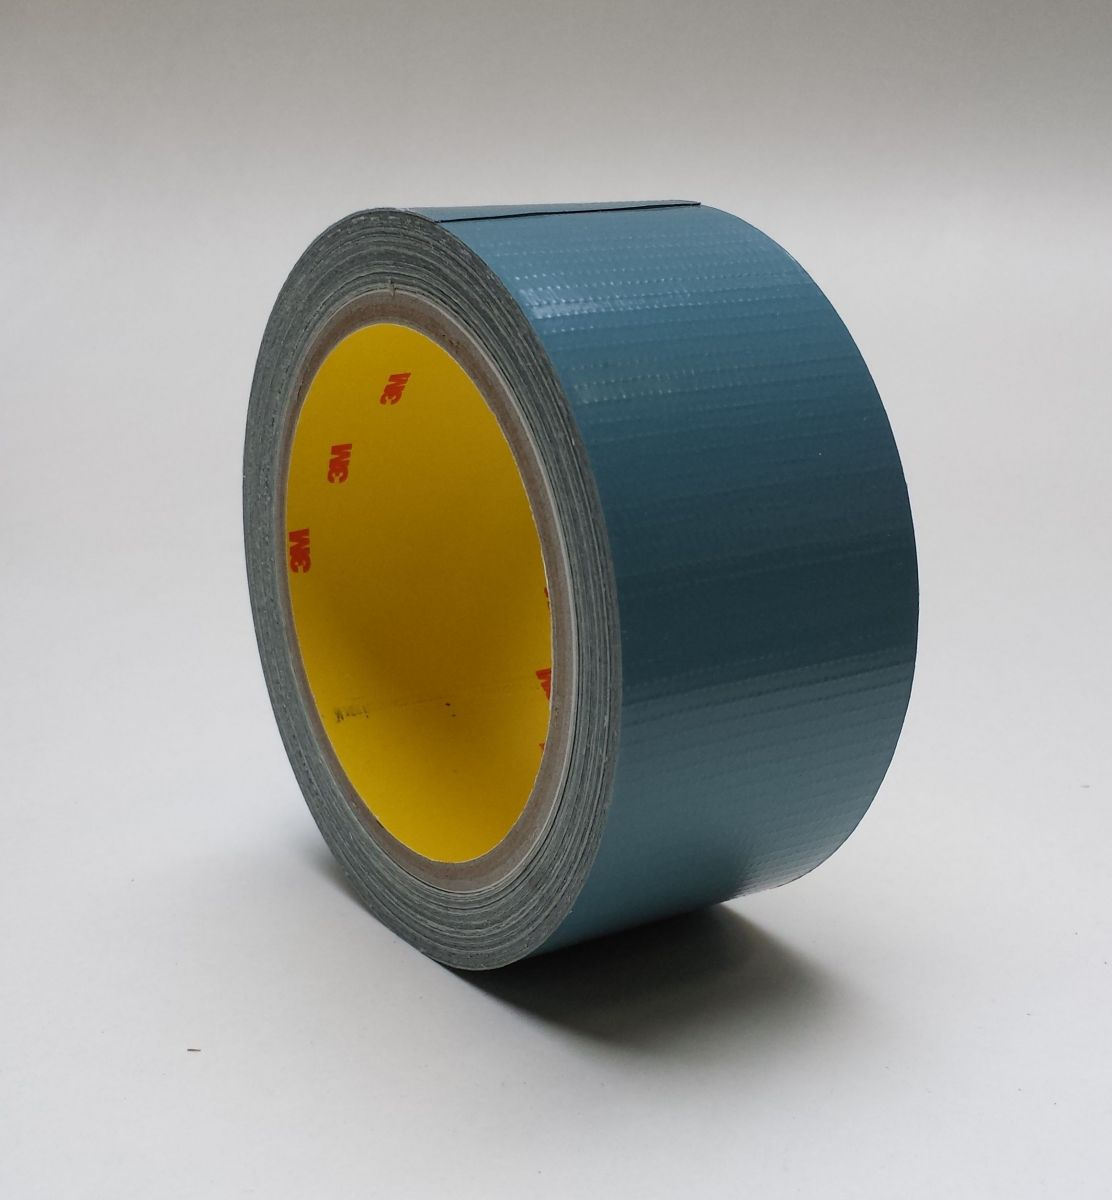 3m uv duct tape 8979 dikte 033mm 48 mm x 11 m leigrijs